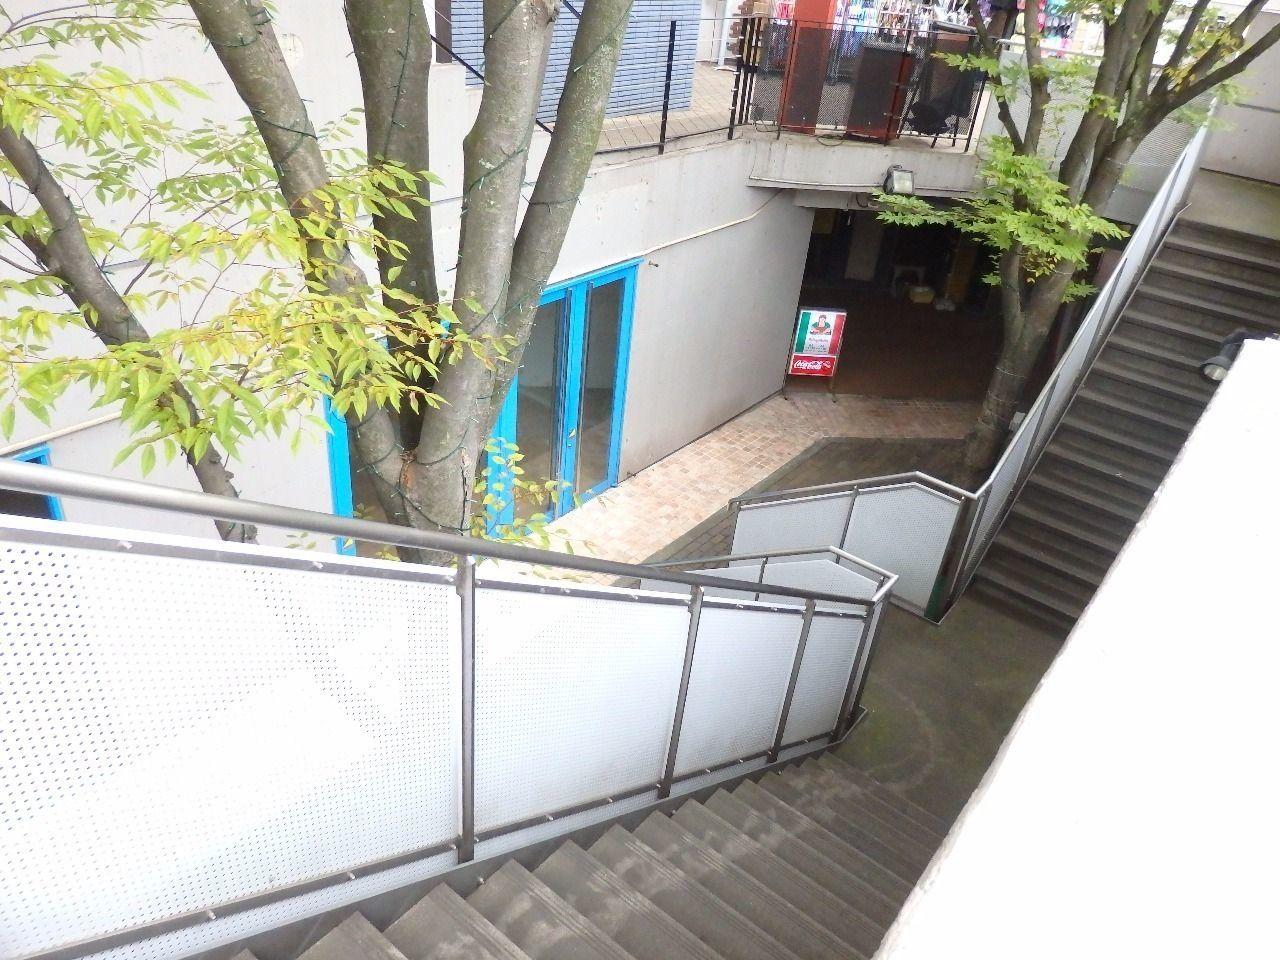 A棟、B棟どちら側からでも正面階段を利用できます。